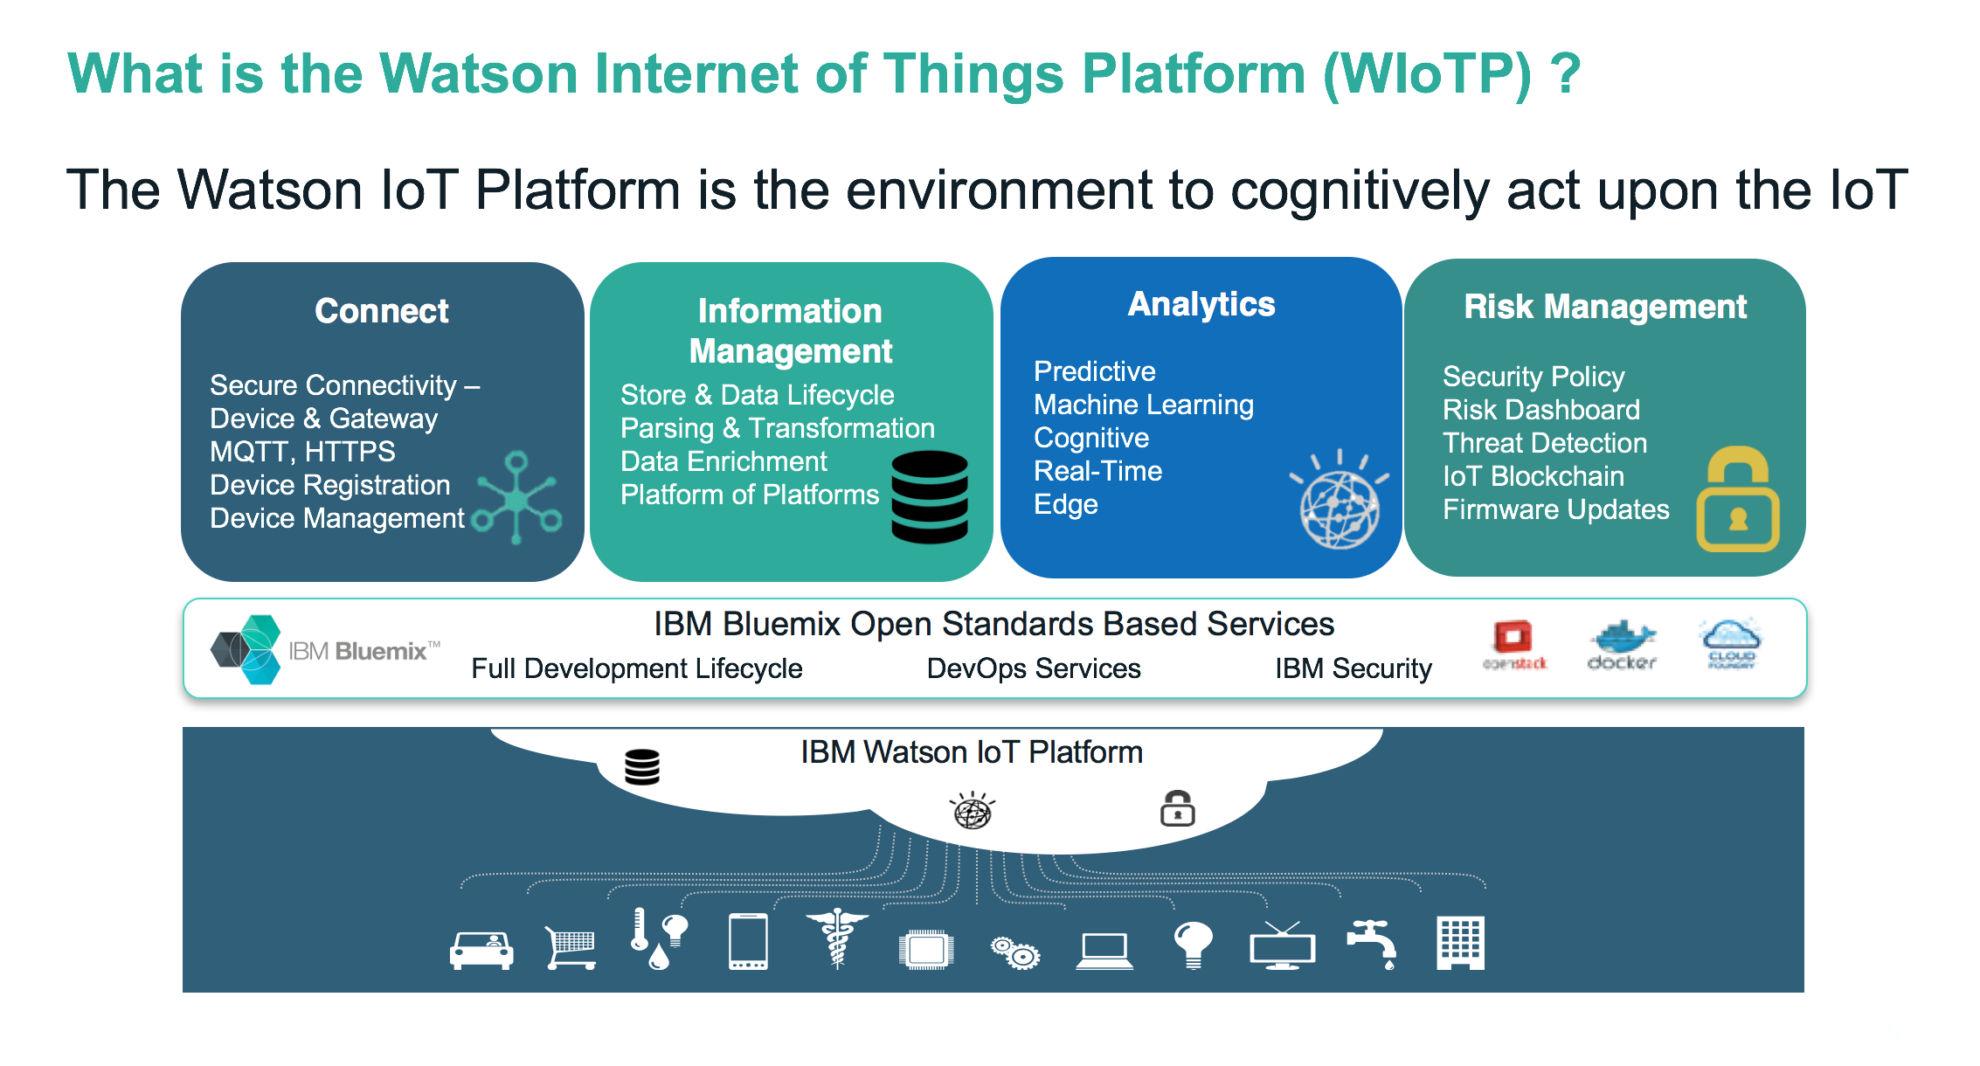 Webcast: IoT use-cases with IBM Watson IoT Platform